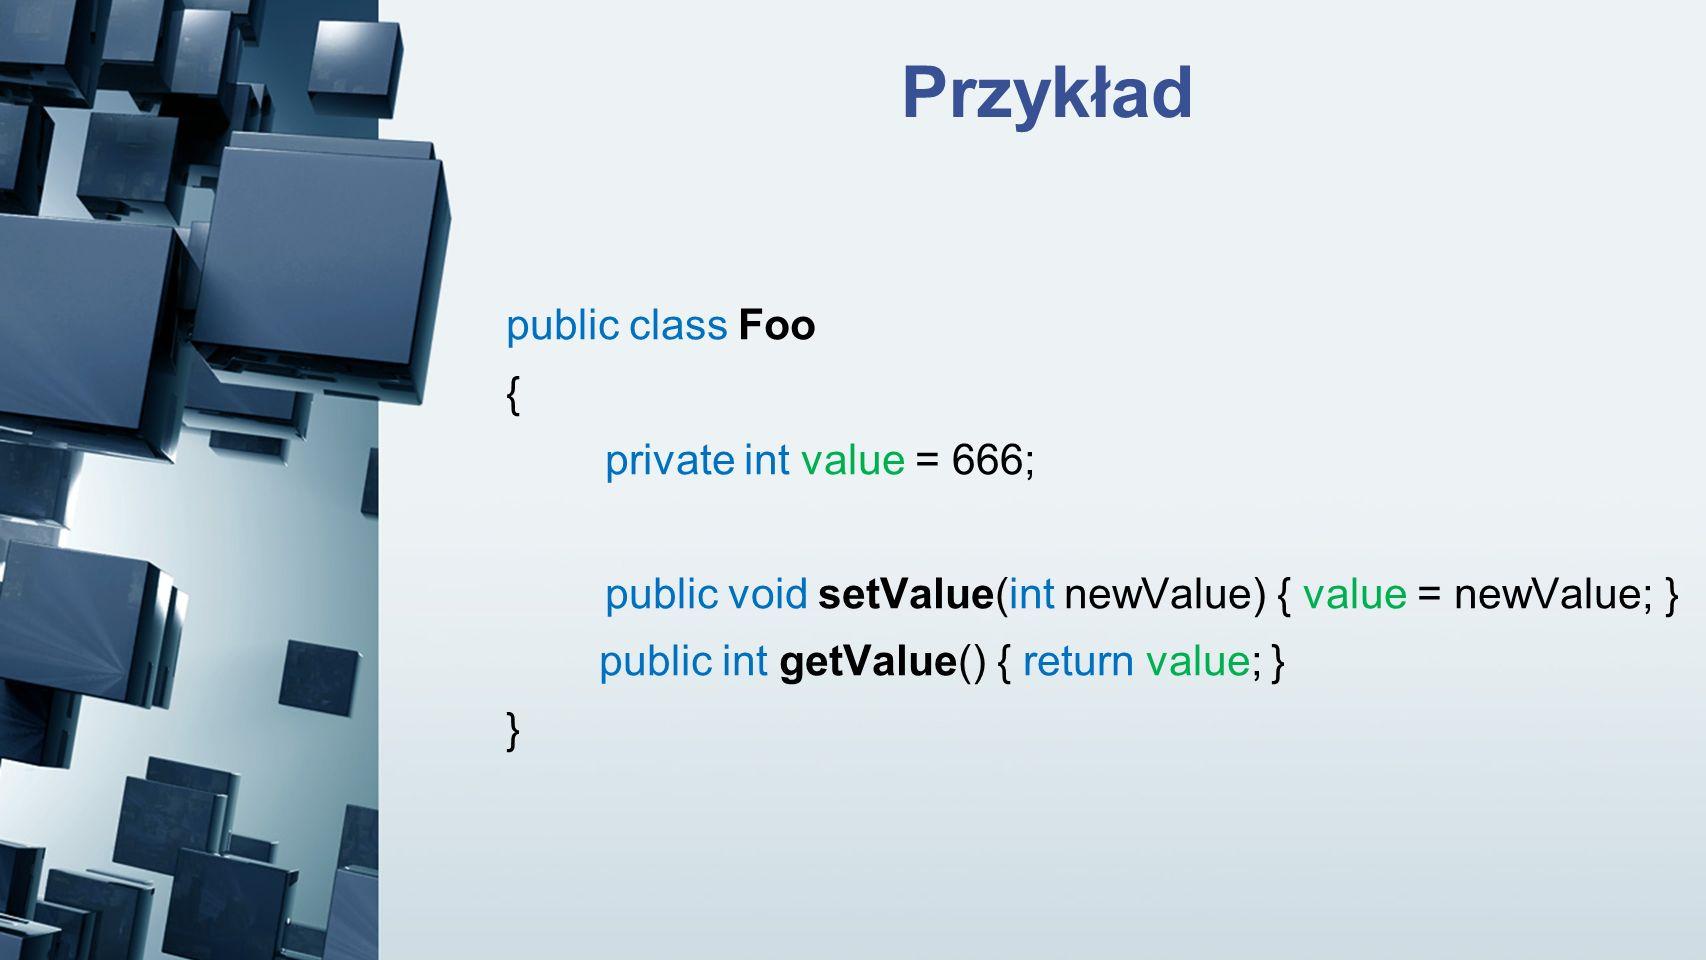 Przykład public class Foo { private int value = 666; public void setValue(int newValue) { value = newValue; } public int getValue() { return value; }